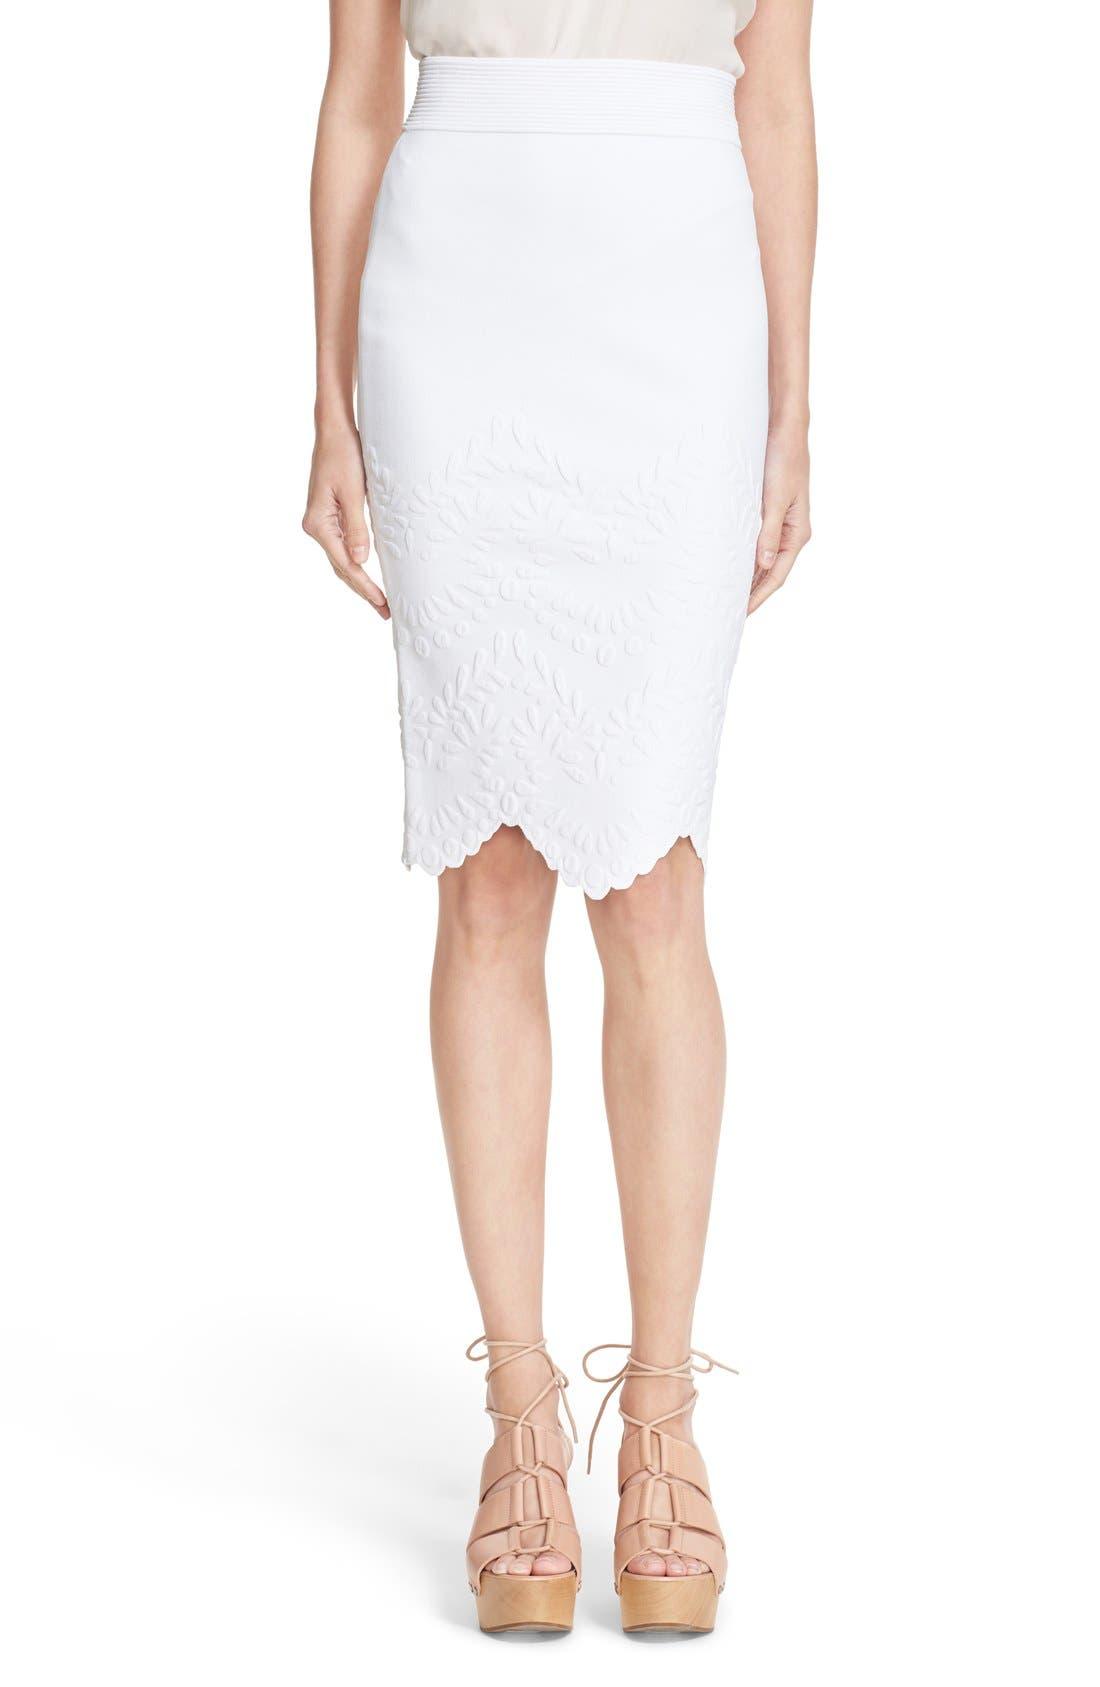 Main Image - Alexander McQueen Embossed Jacquard Knit Pencil Skirt